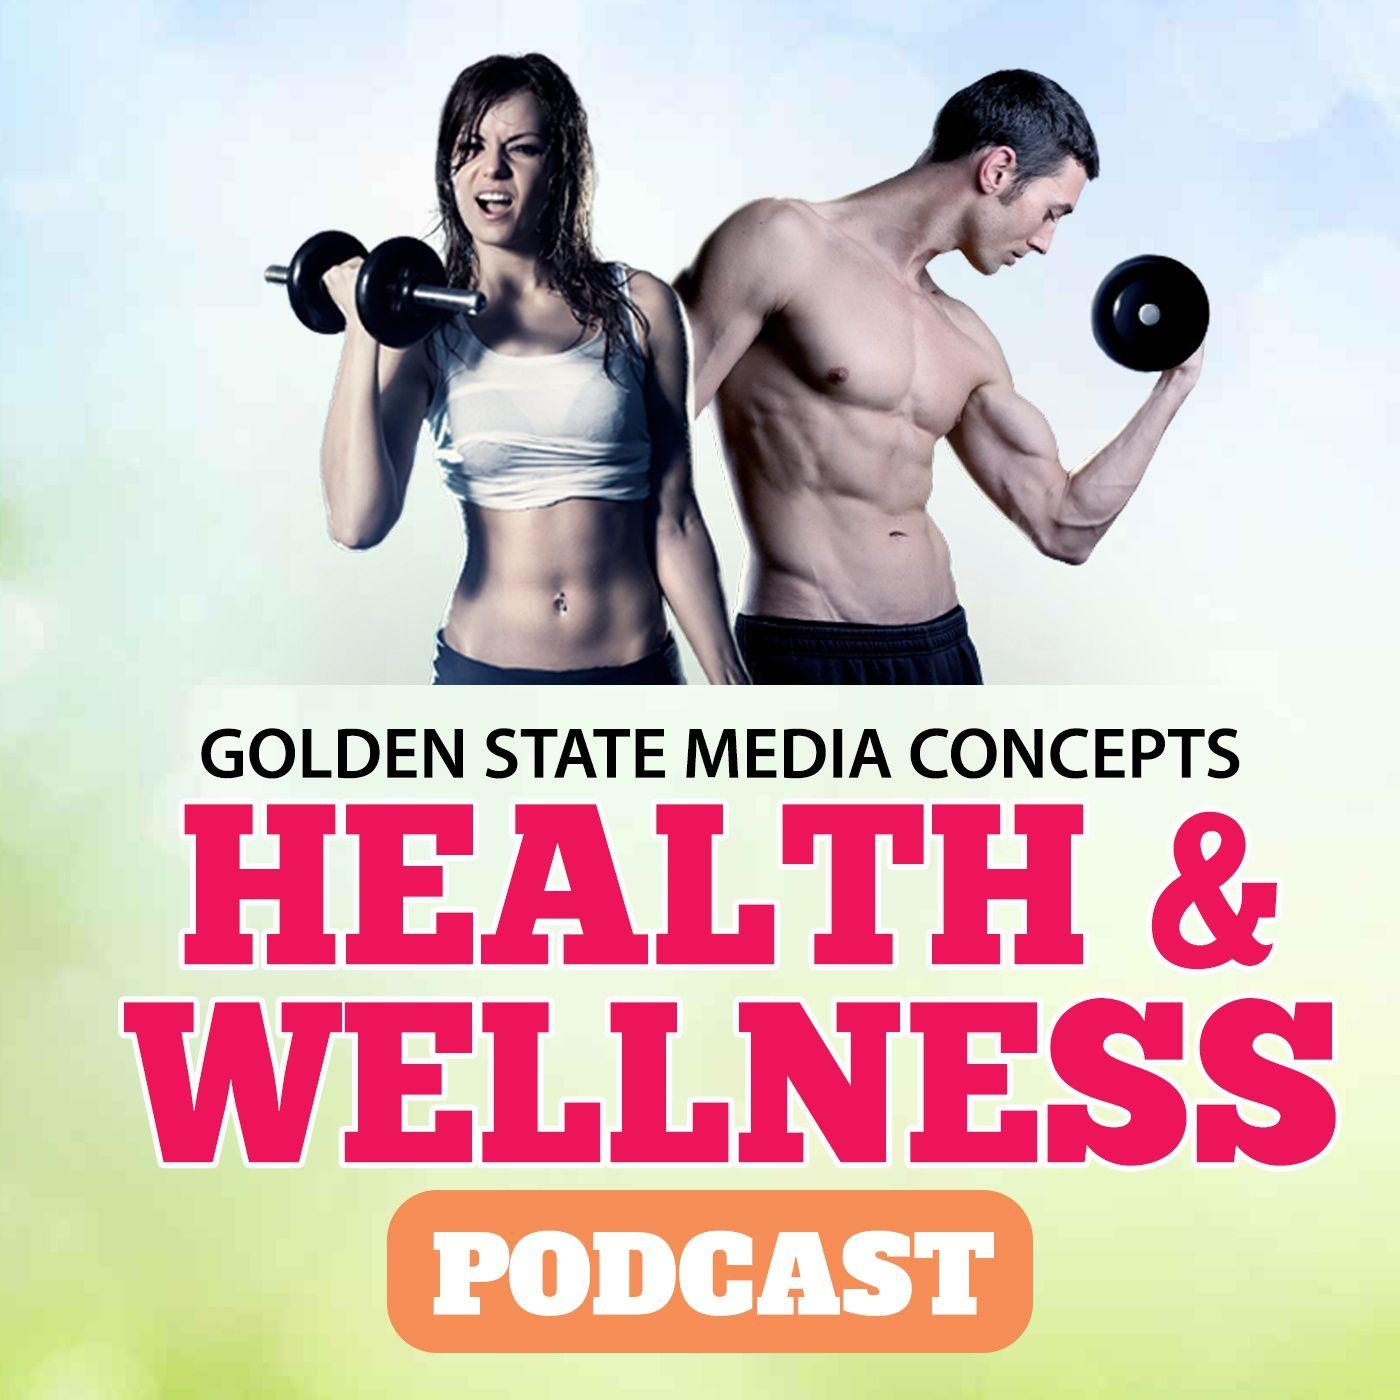 GSMC Health & Wellness Podcast Episode 247: Environmental Wellness